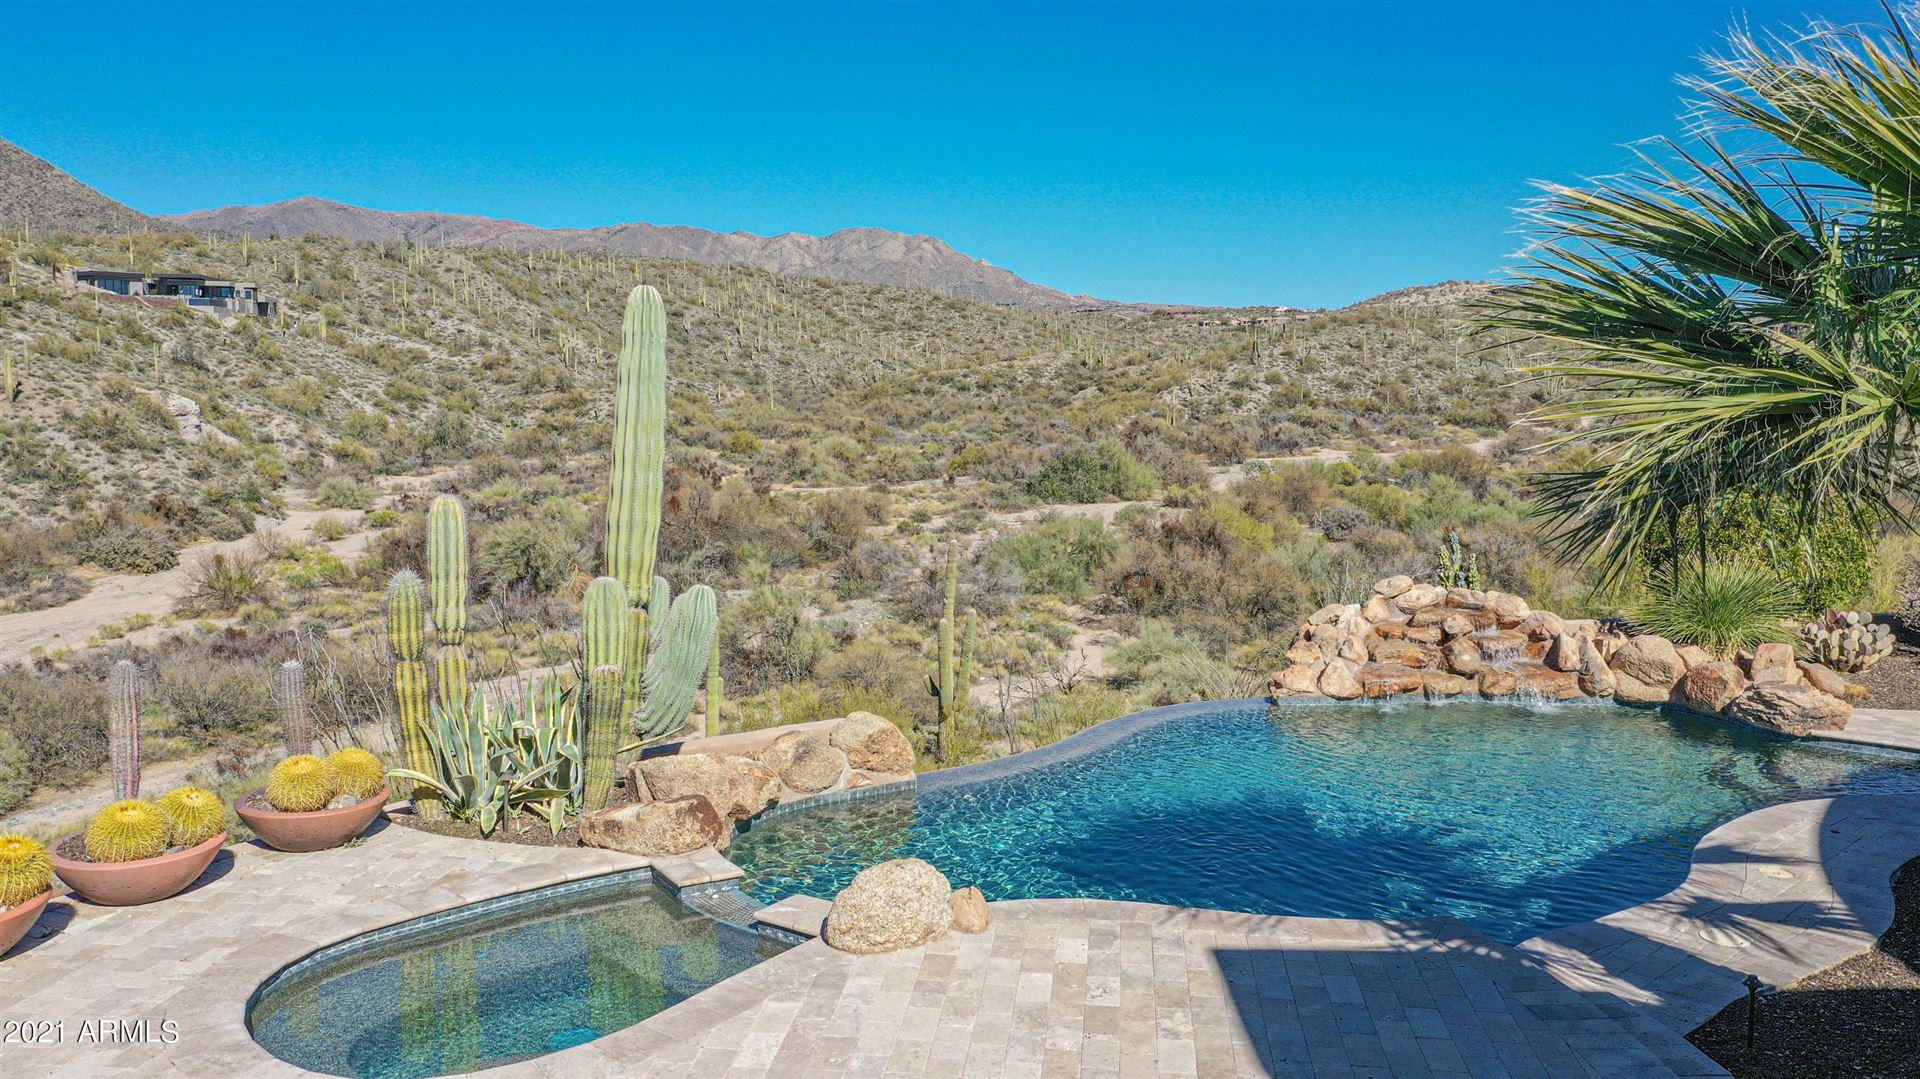 Photo of 8390 E Coronado Trail, Carefree, AZ 85377 (MLS # 6199274)